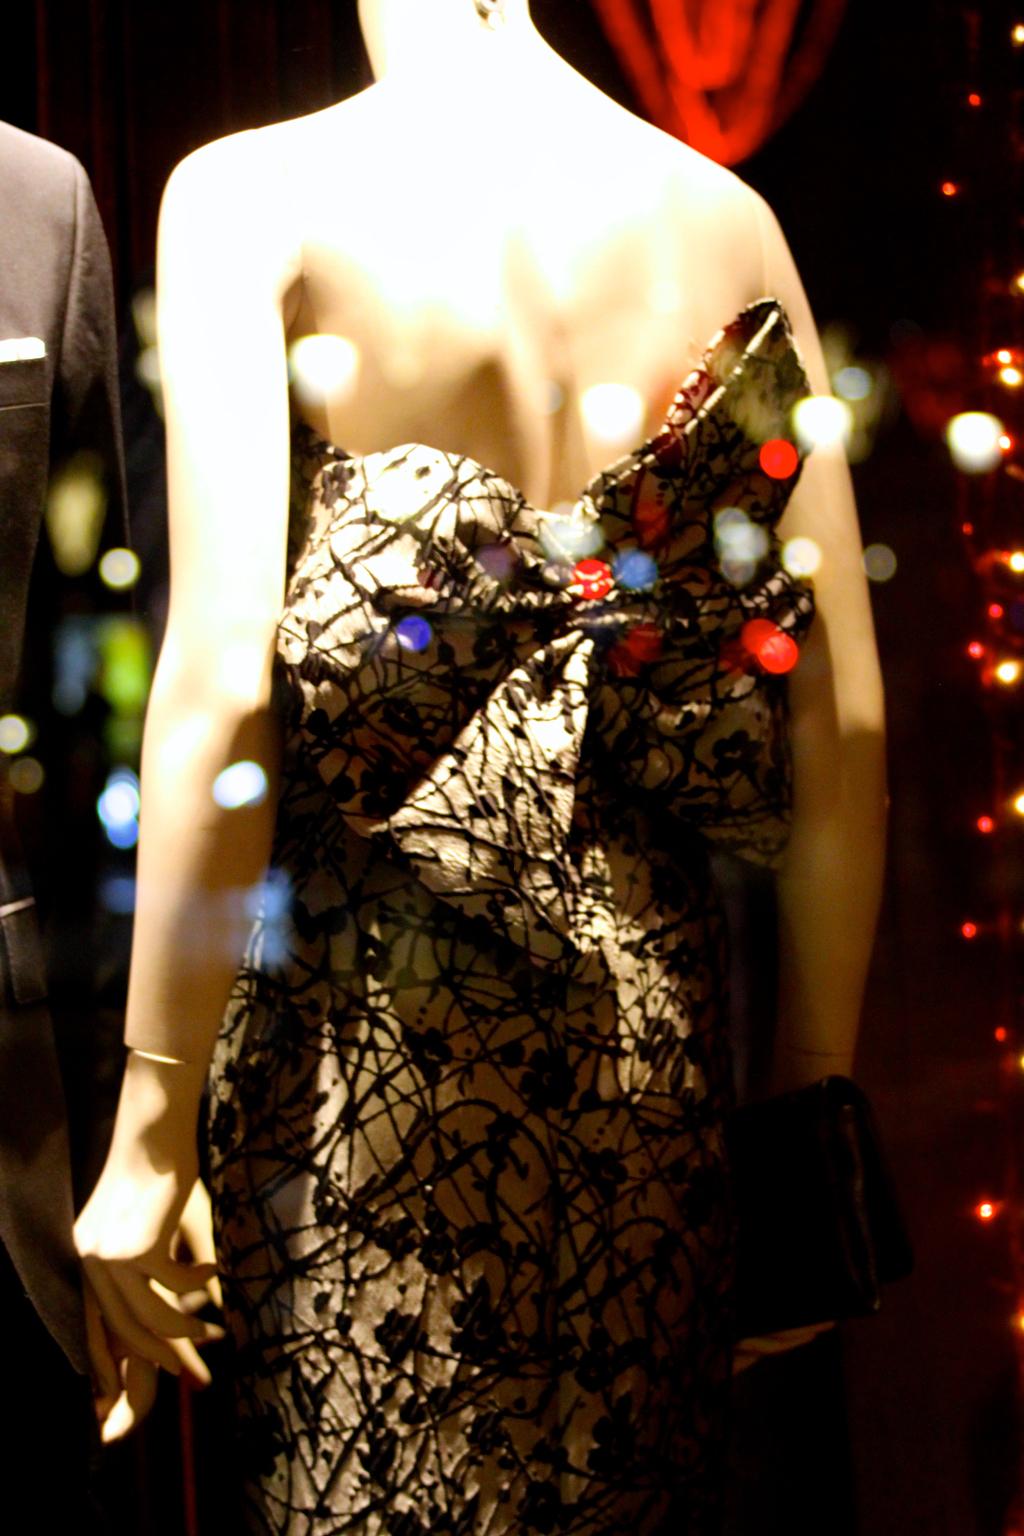 caroline_herrera_fashion_bow_dress_robe_noeud_hiver_noel_christmas_navidad_2015_2016